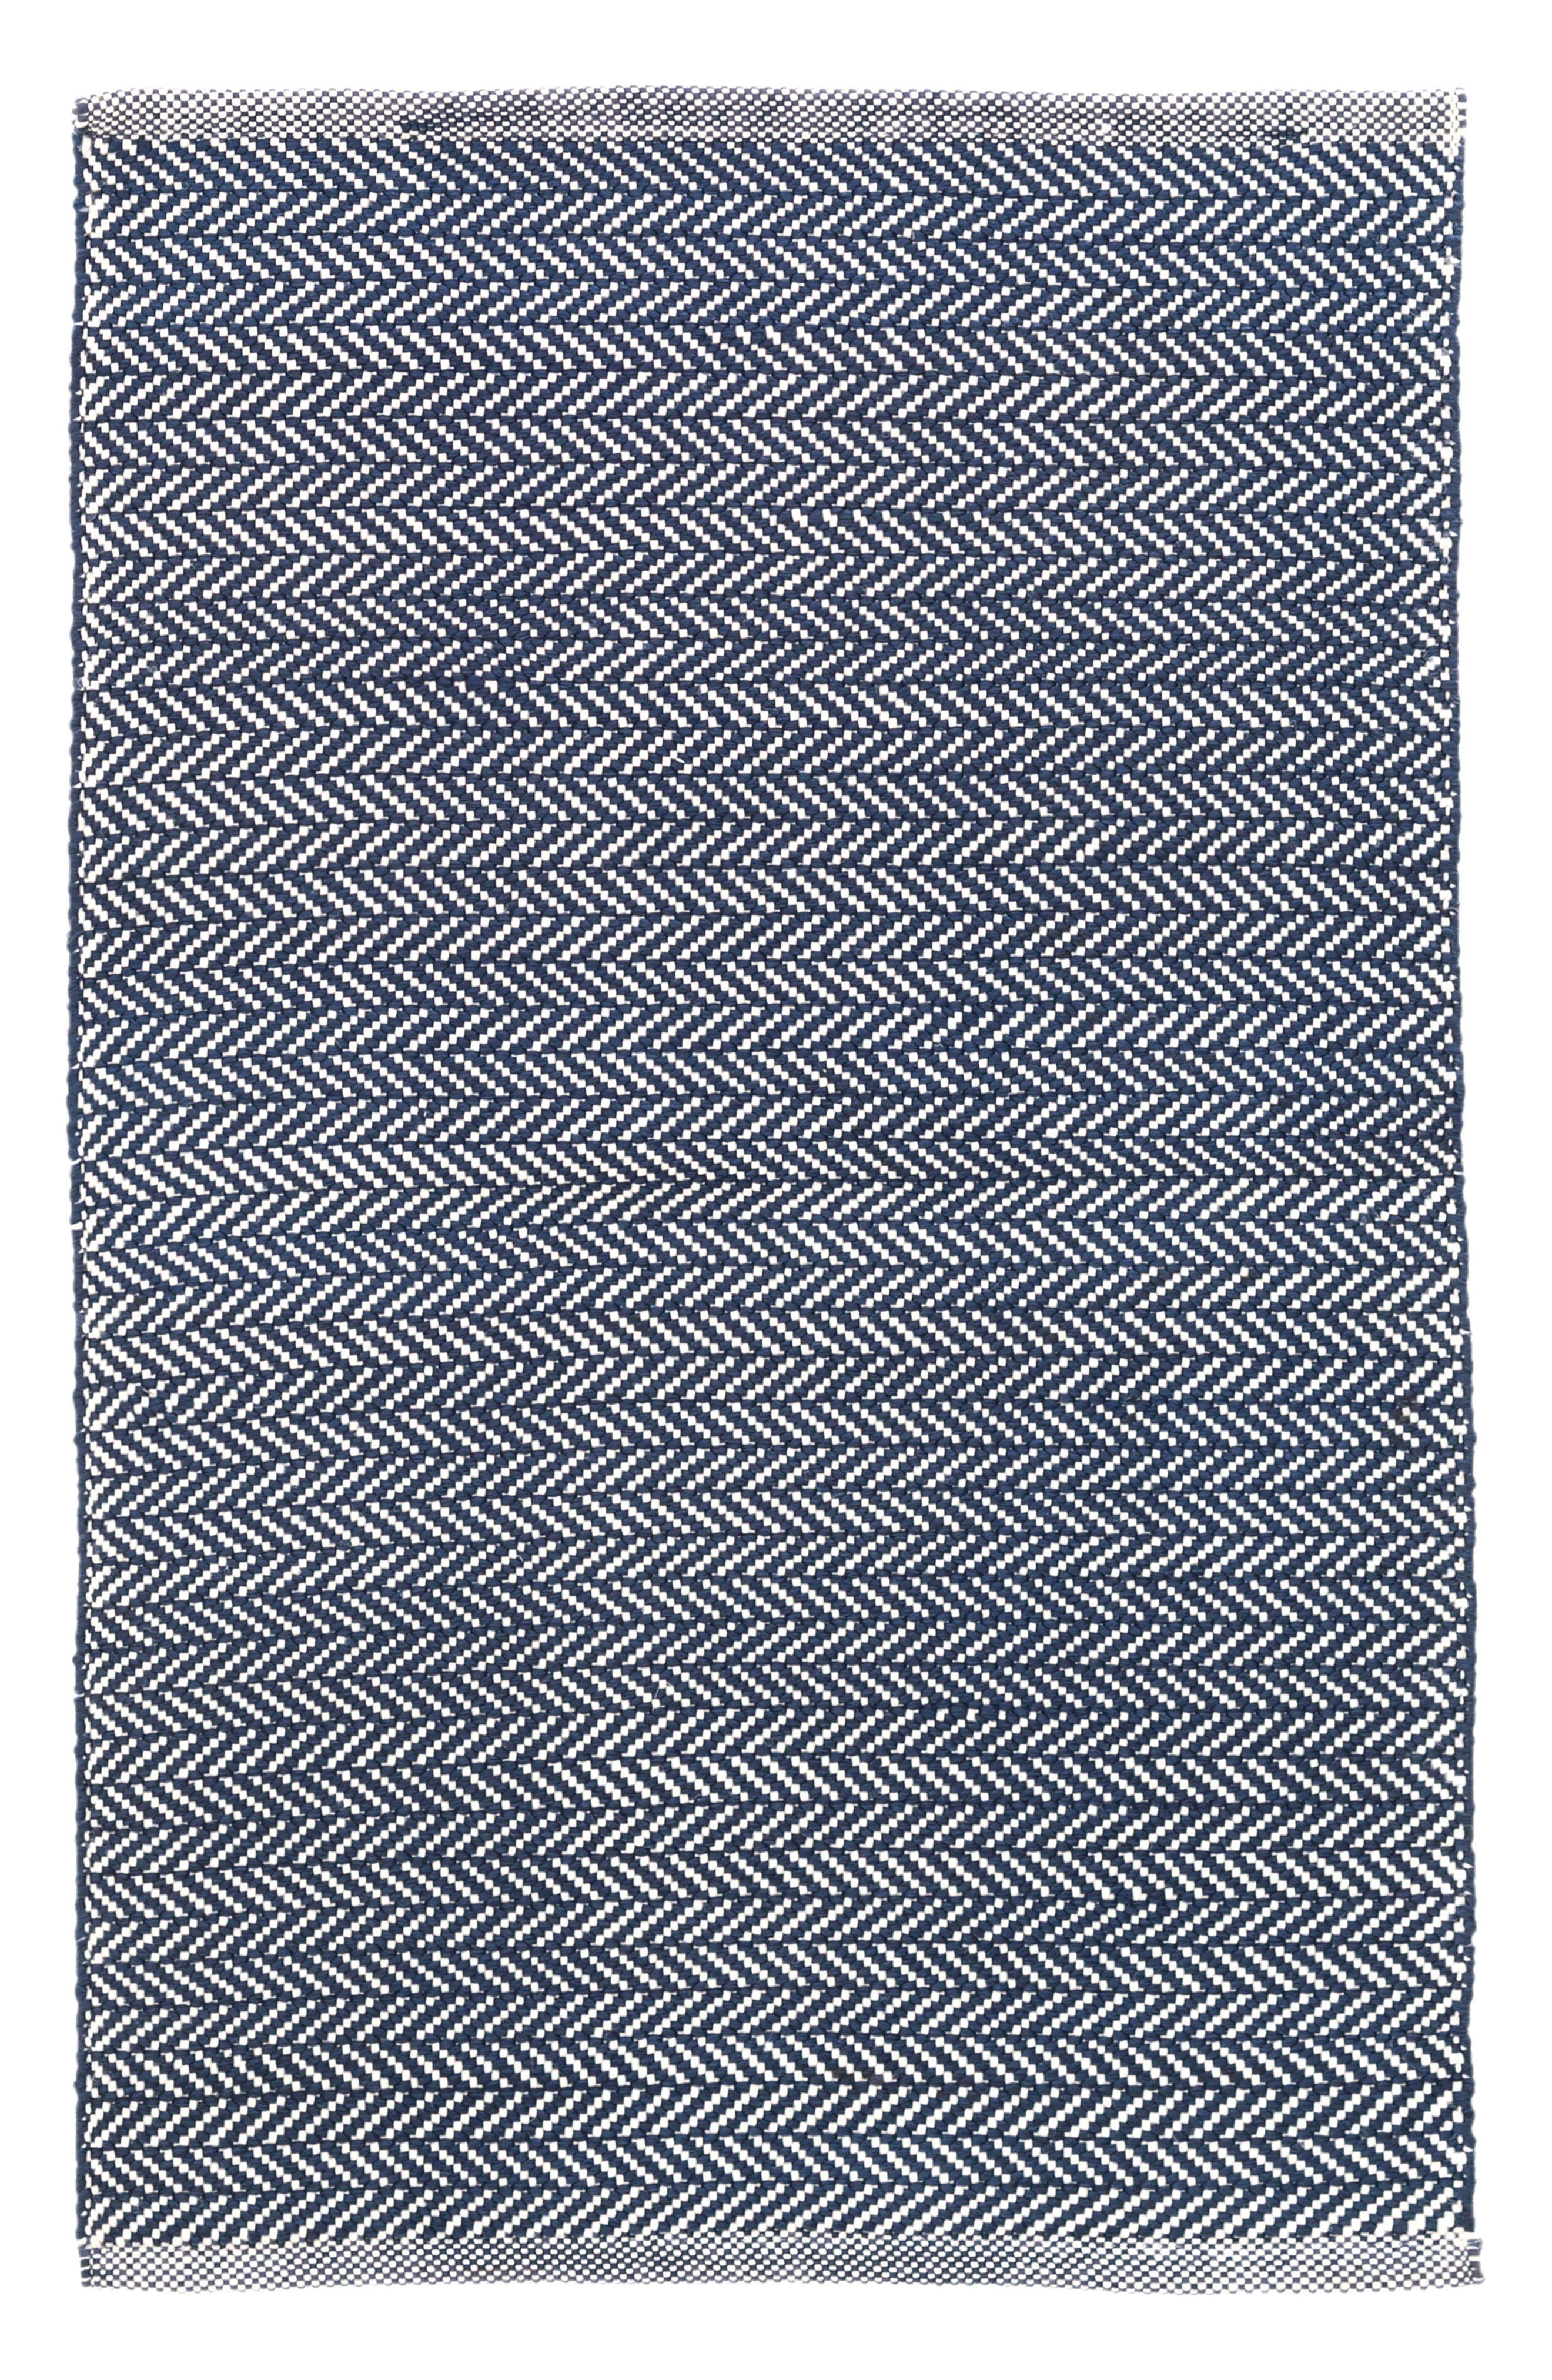 Herringbone Rug,                         Main,                         color, 460